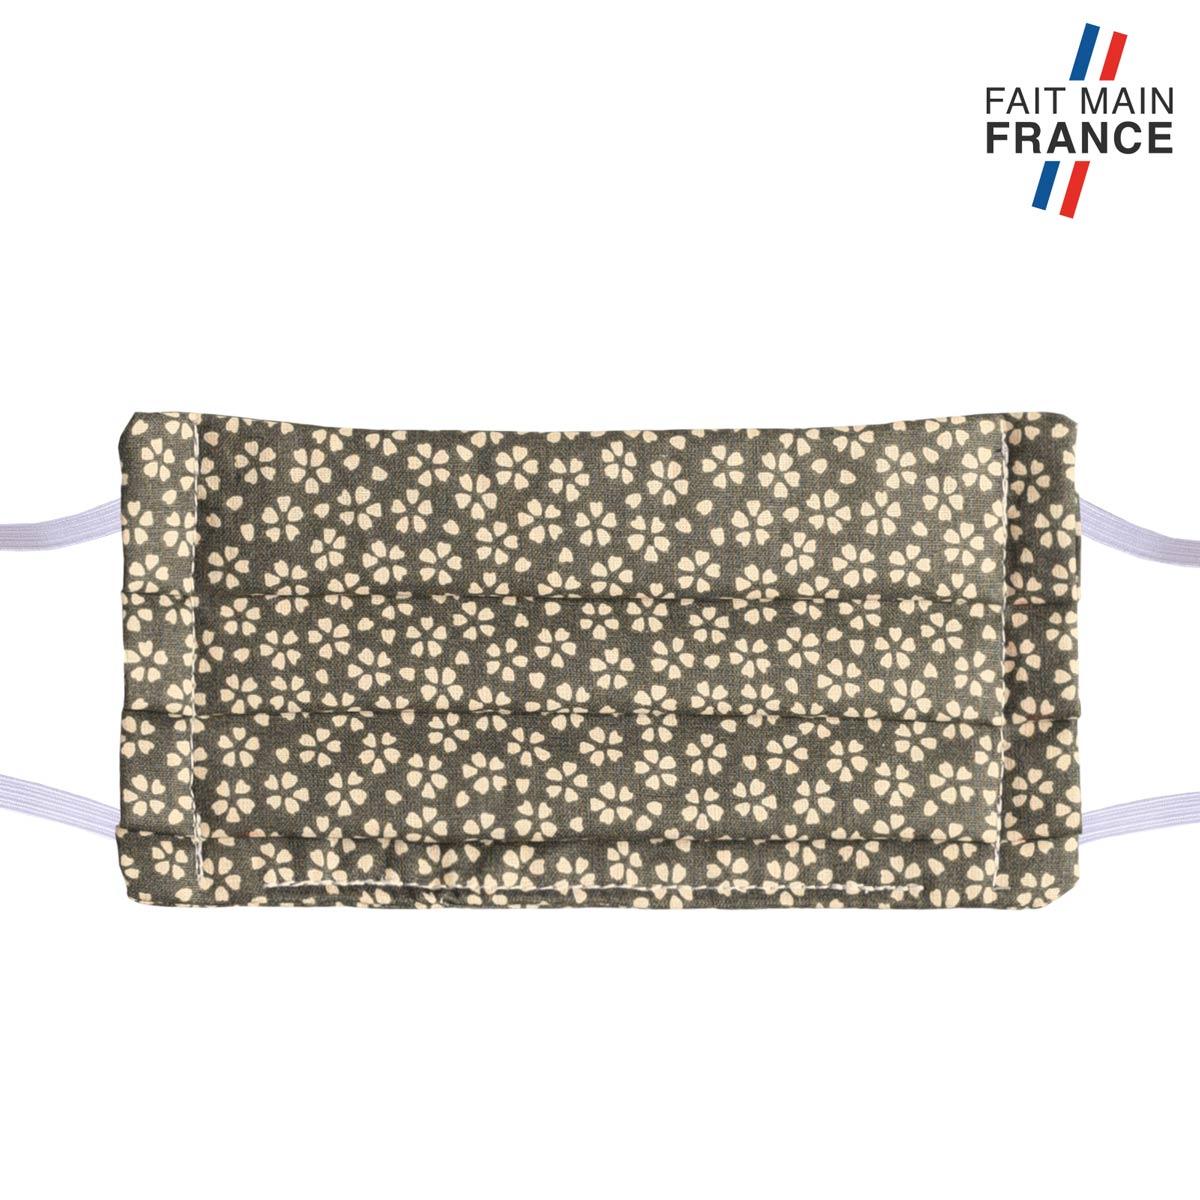 AT-06125-A12-Masque-triple-couche-liberty-marron